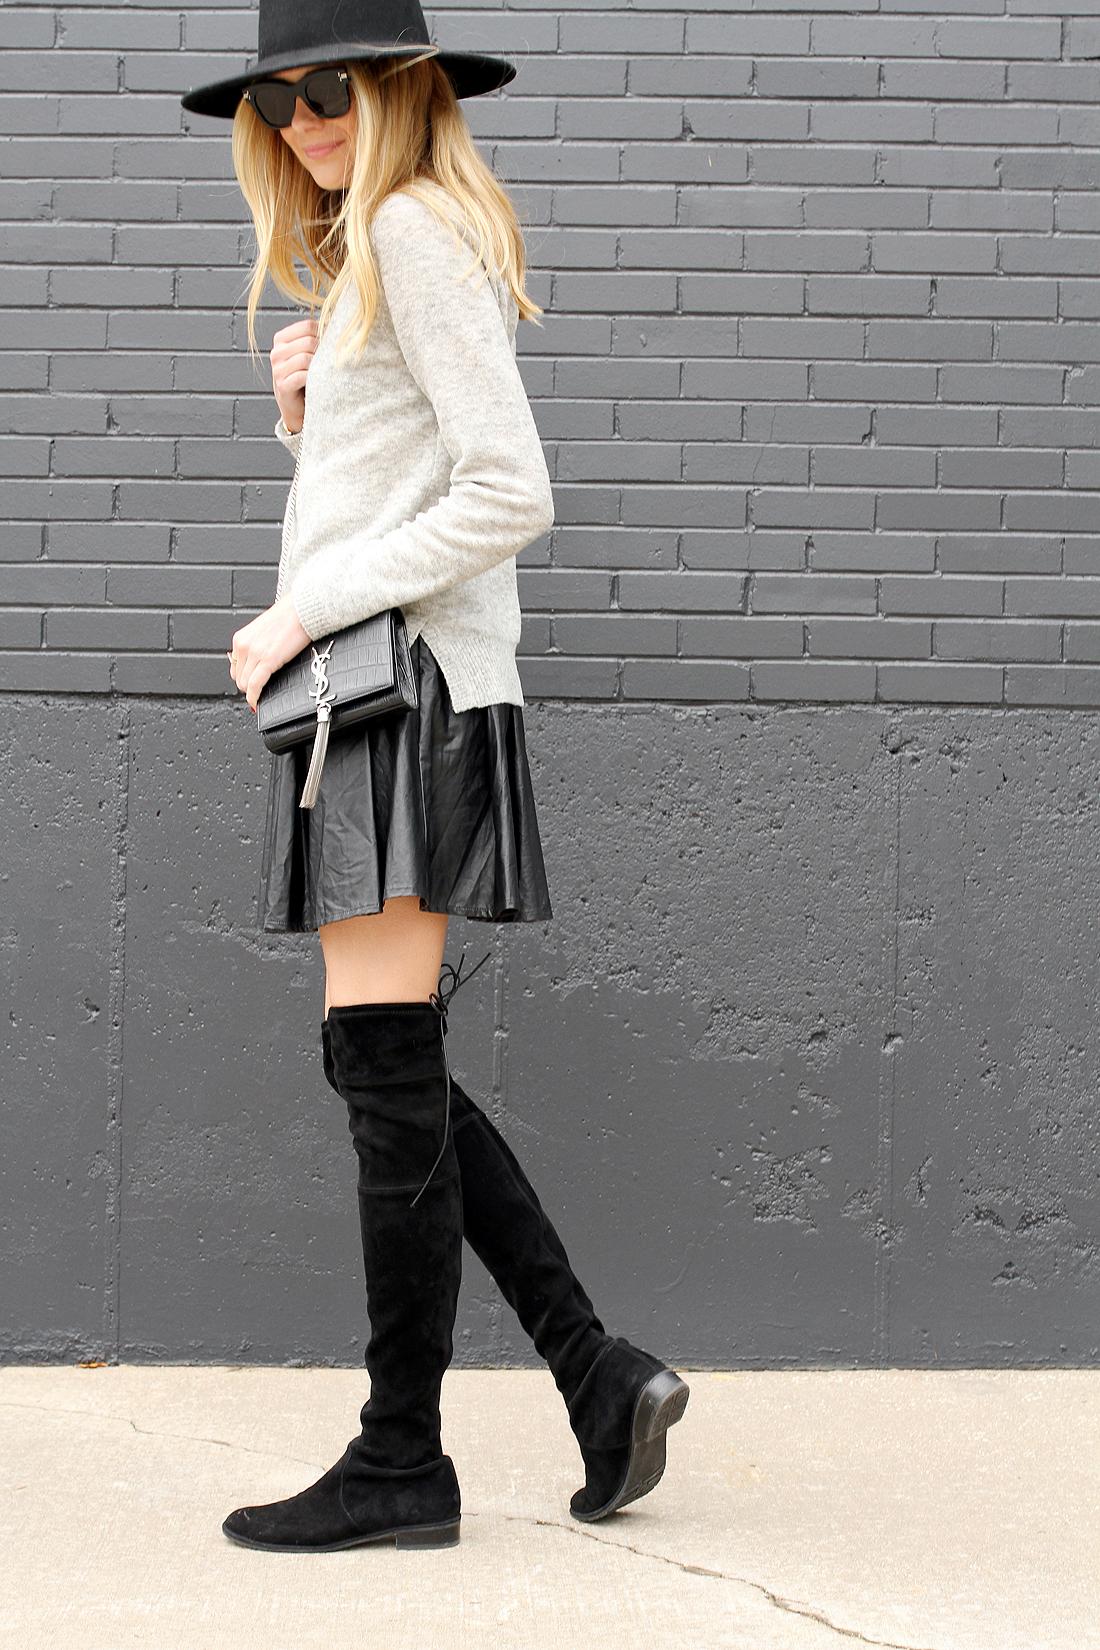 fashion-jackson-grey-sweater-black-pleated-skirt-black-otk-boots-ysl-monogram-crossbody-black-wool-hat